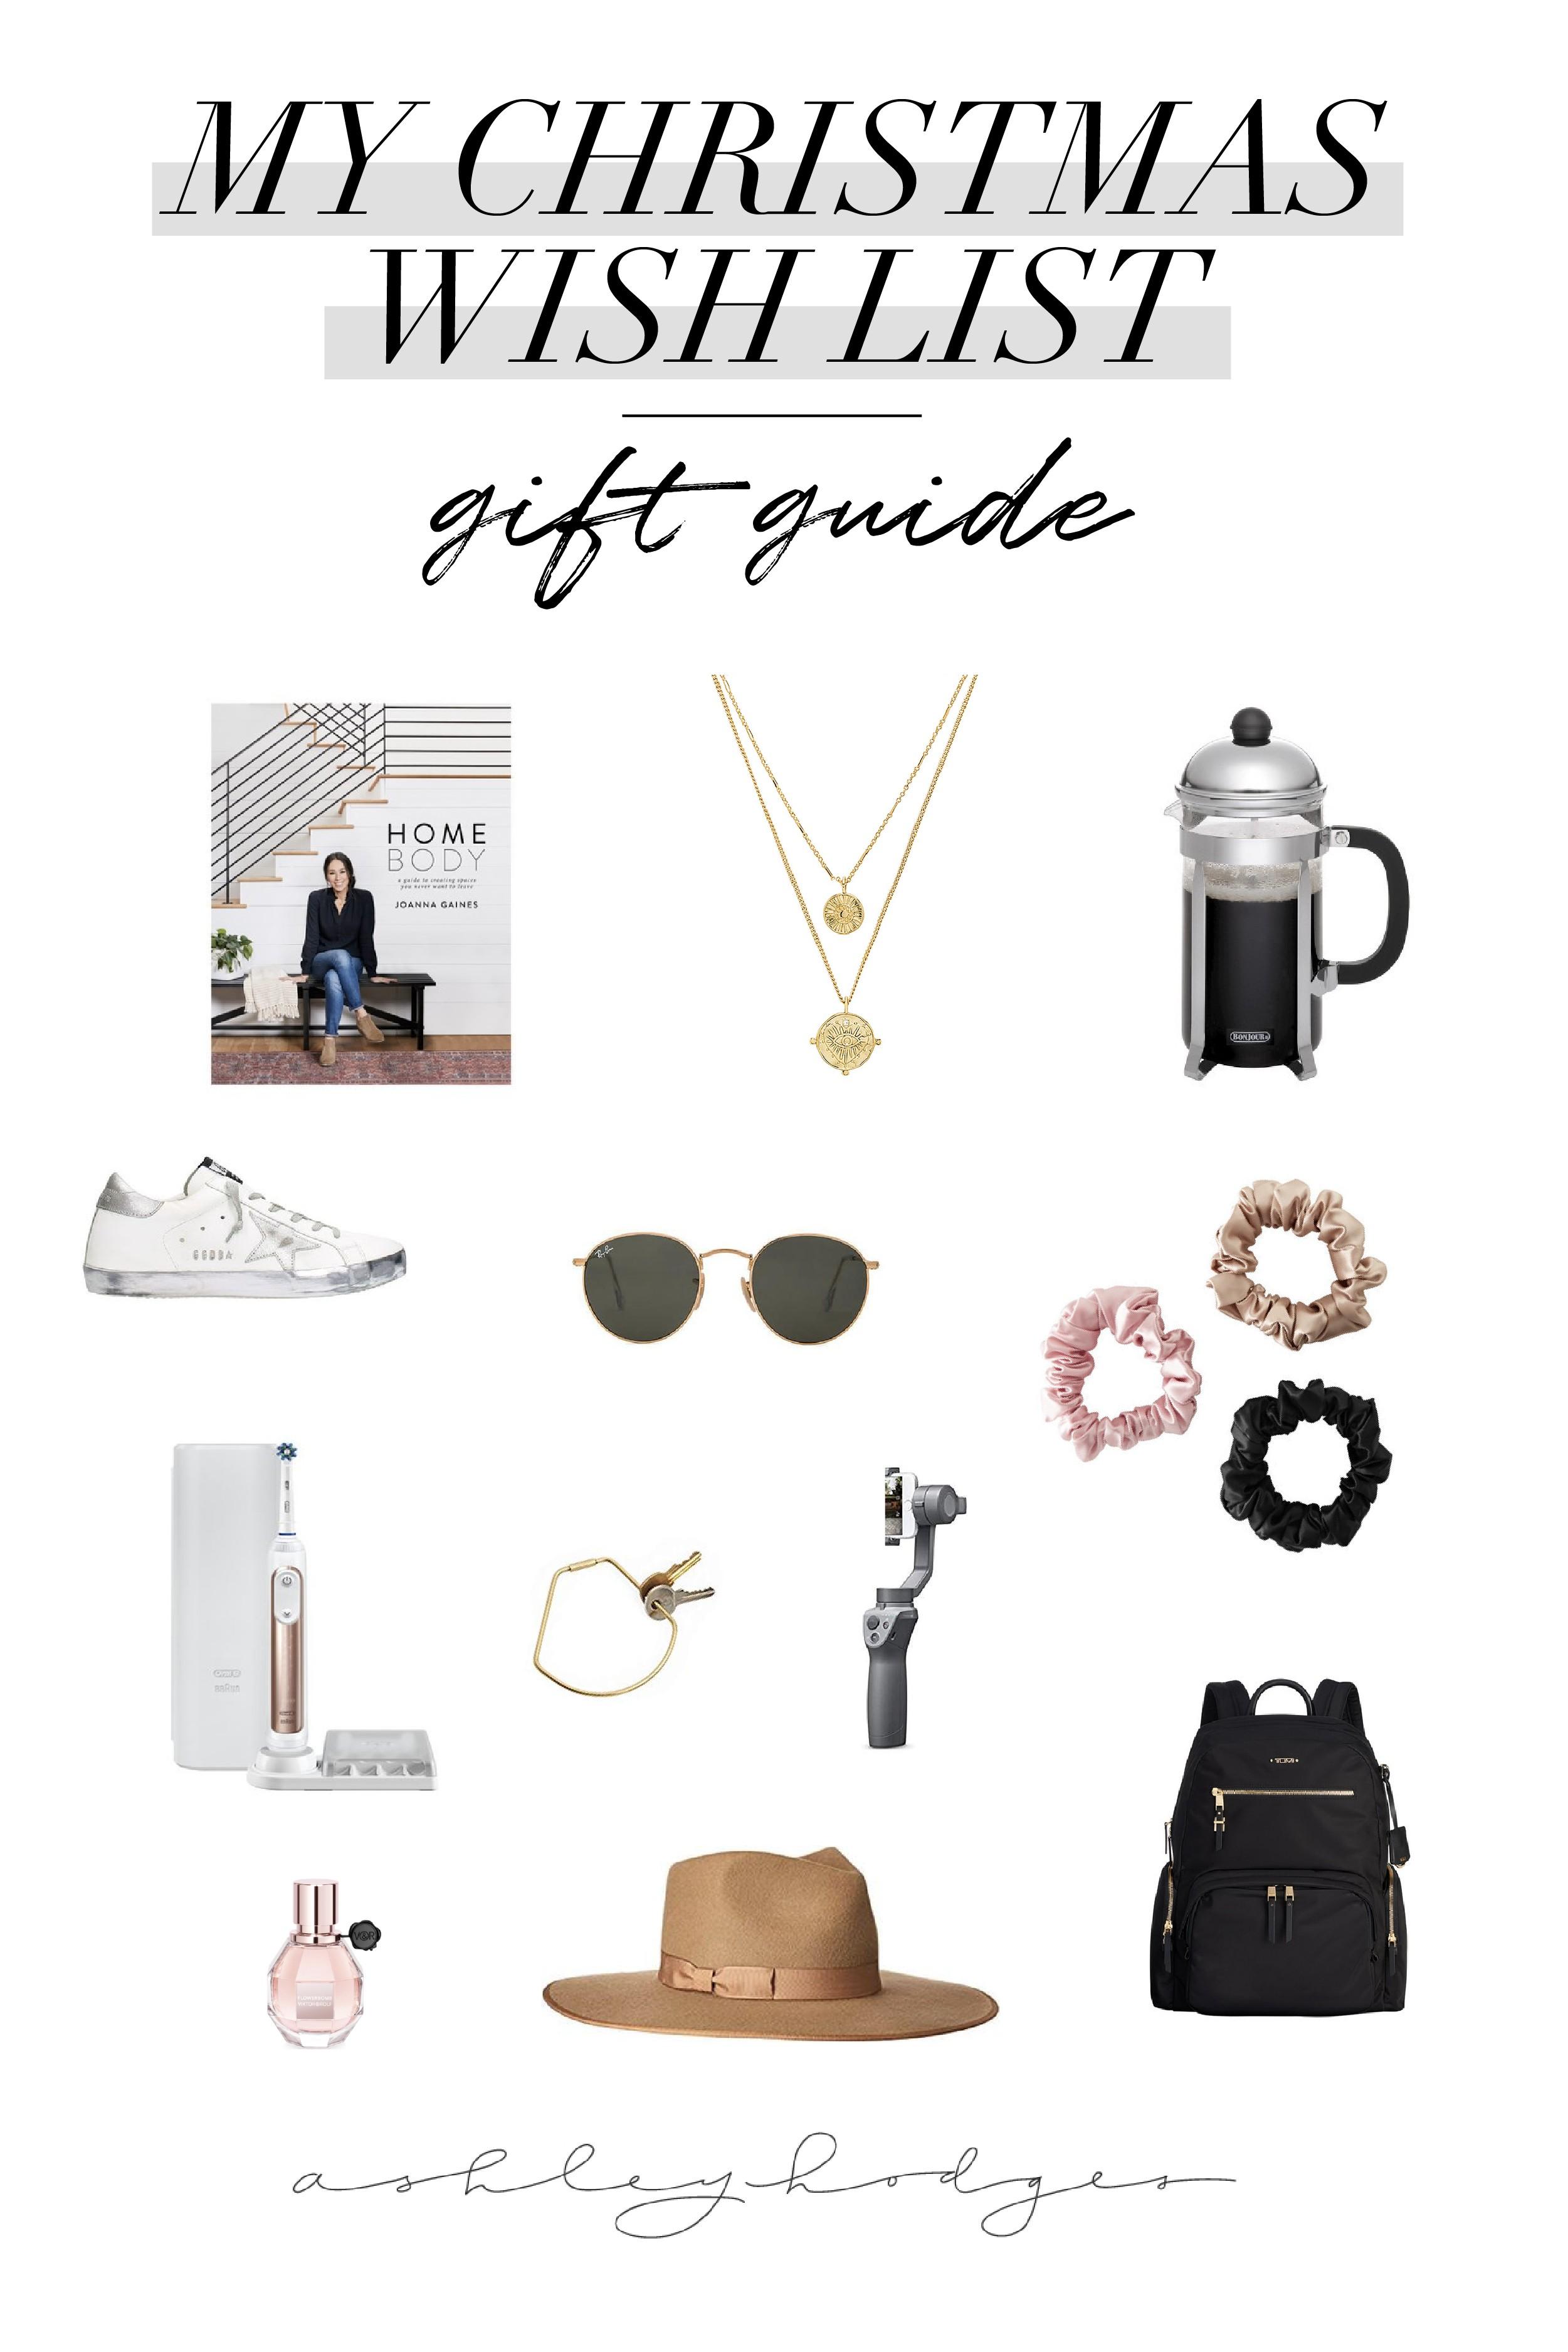 My Christmas Wish List.The Ultimate Christas Wish List Gift Guide Ashley Hodges